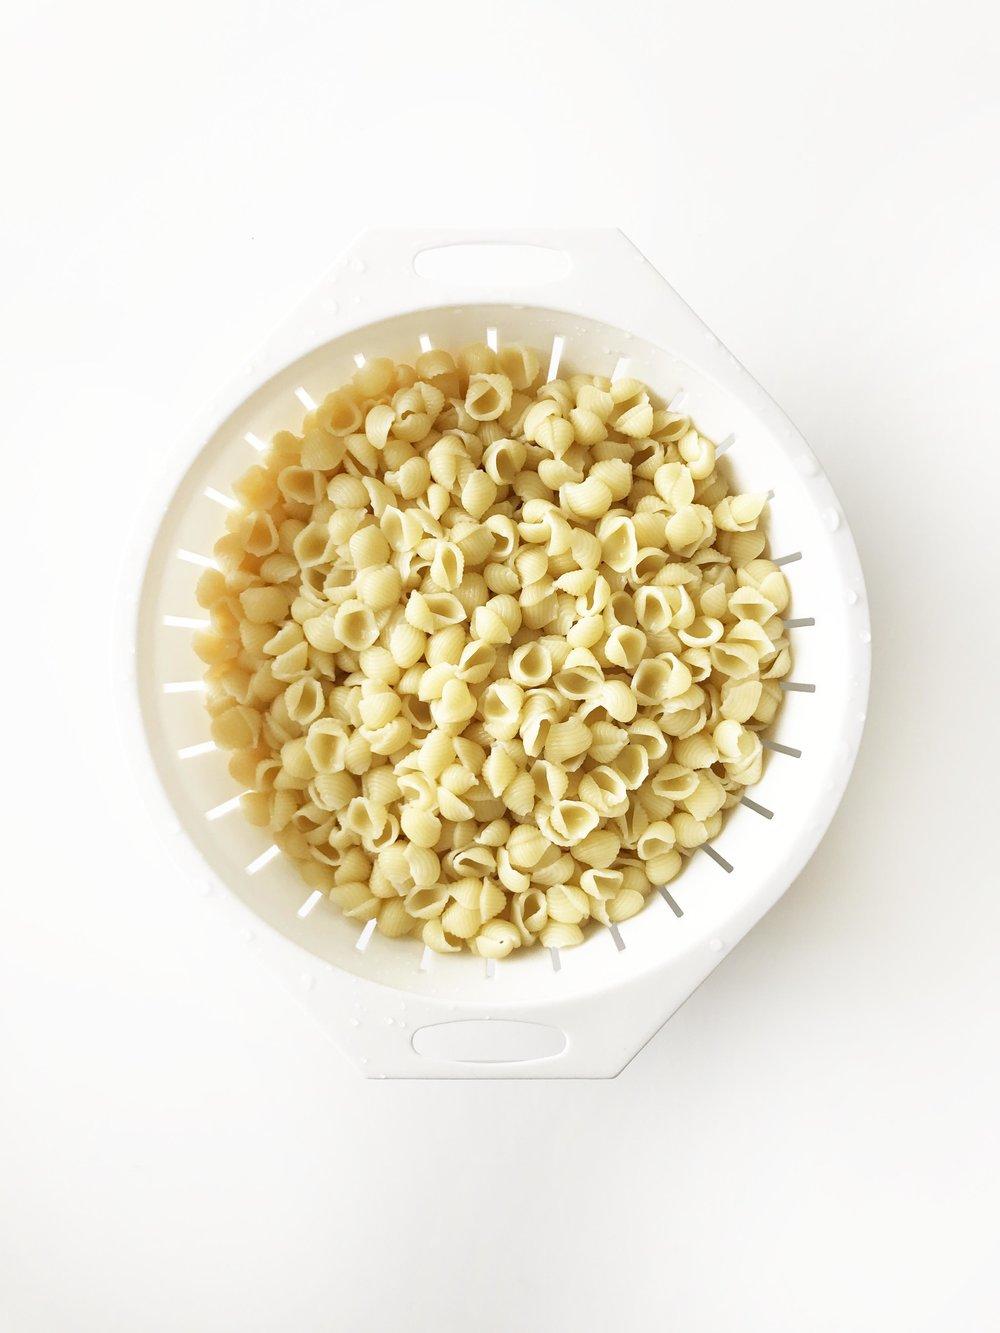 seashell-pasta-salad.jpg